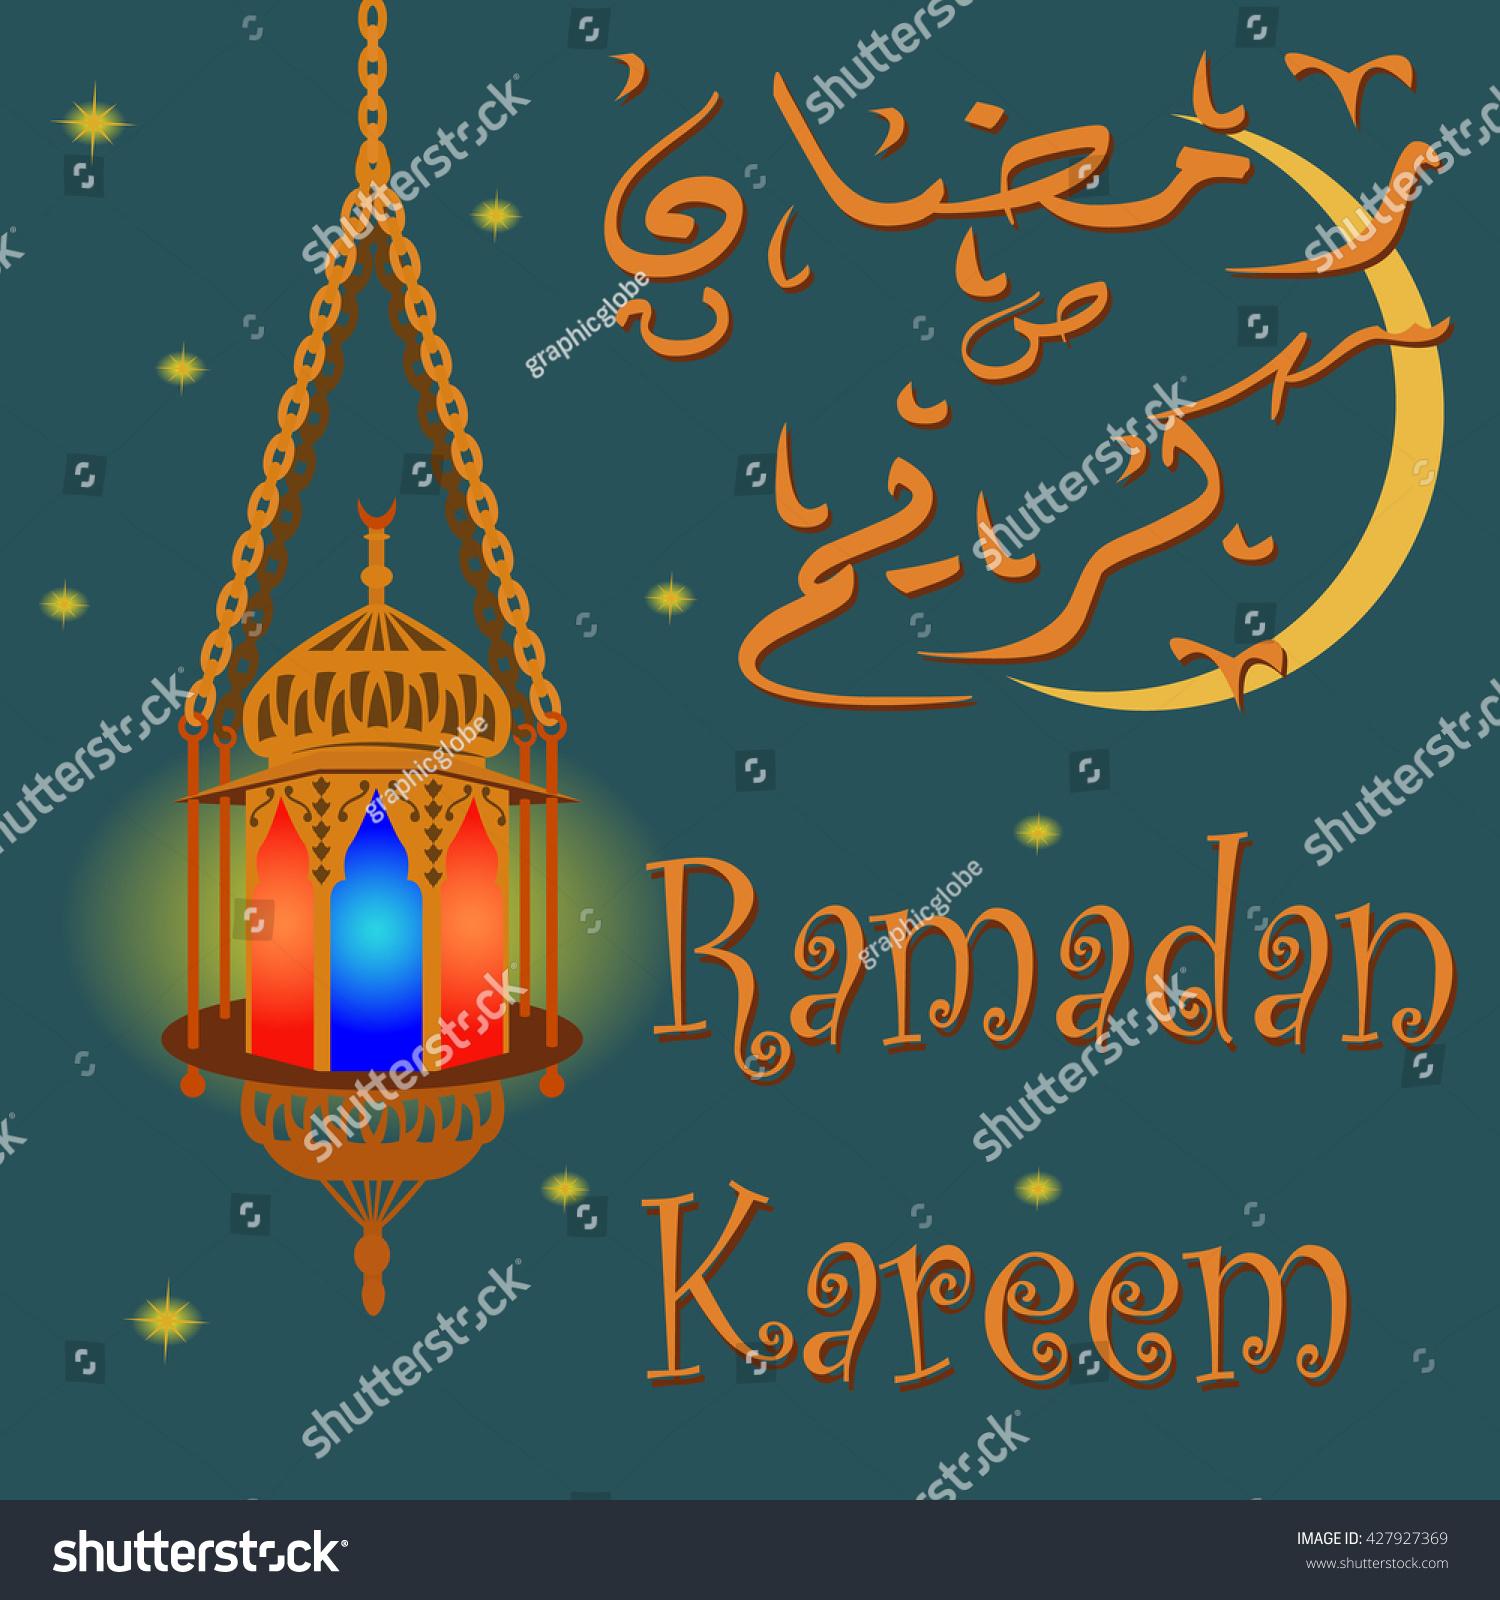 Ramadan Kareem Greeting English Arabic Calligraphy Stock Vector